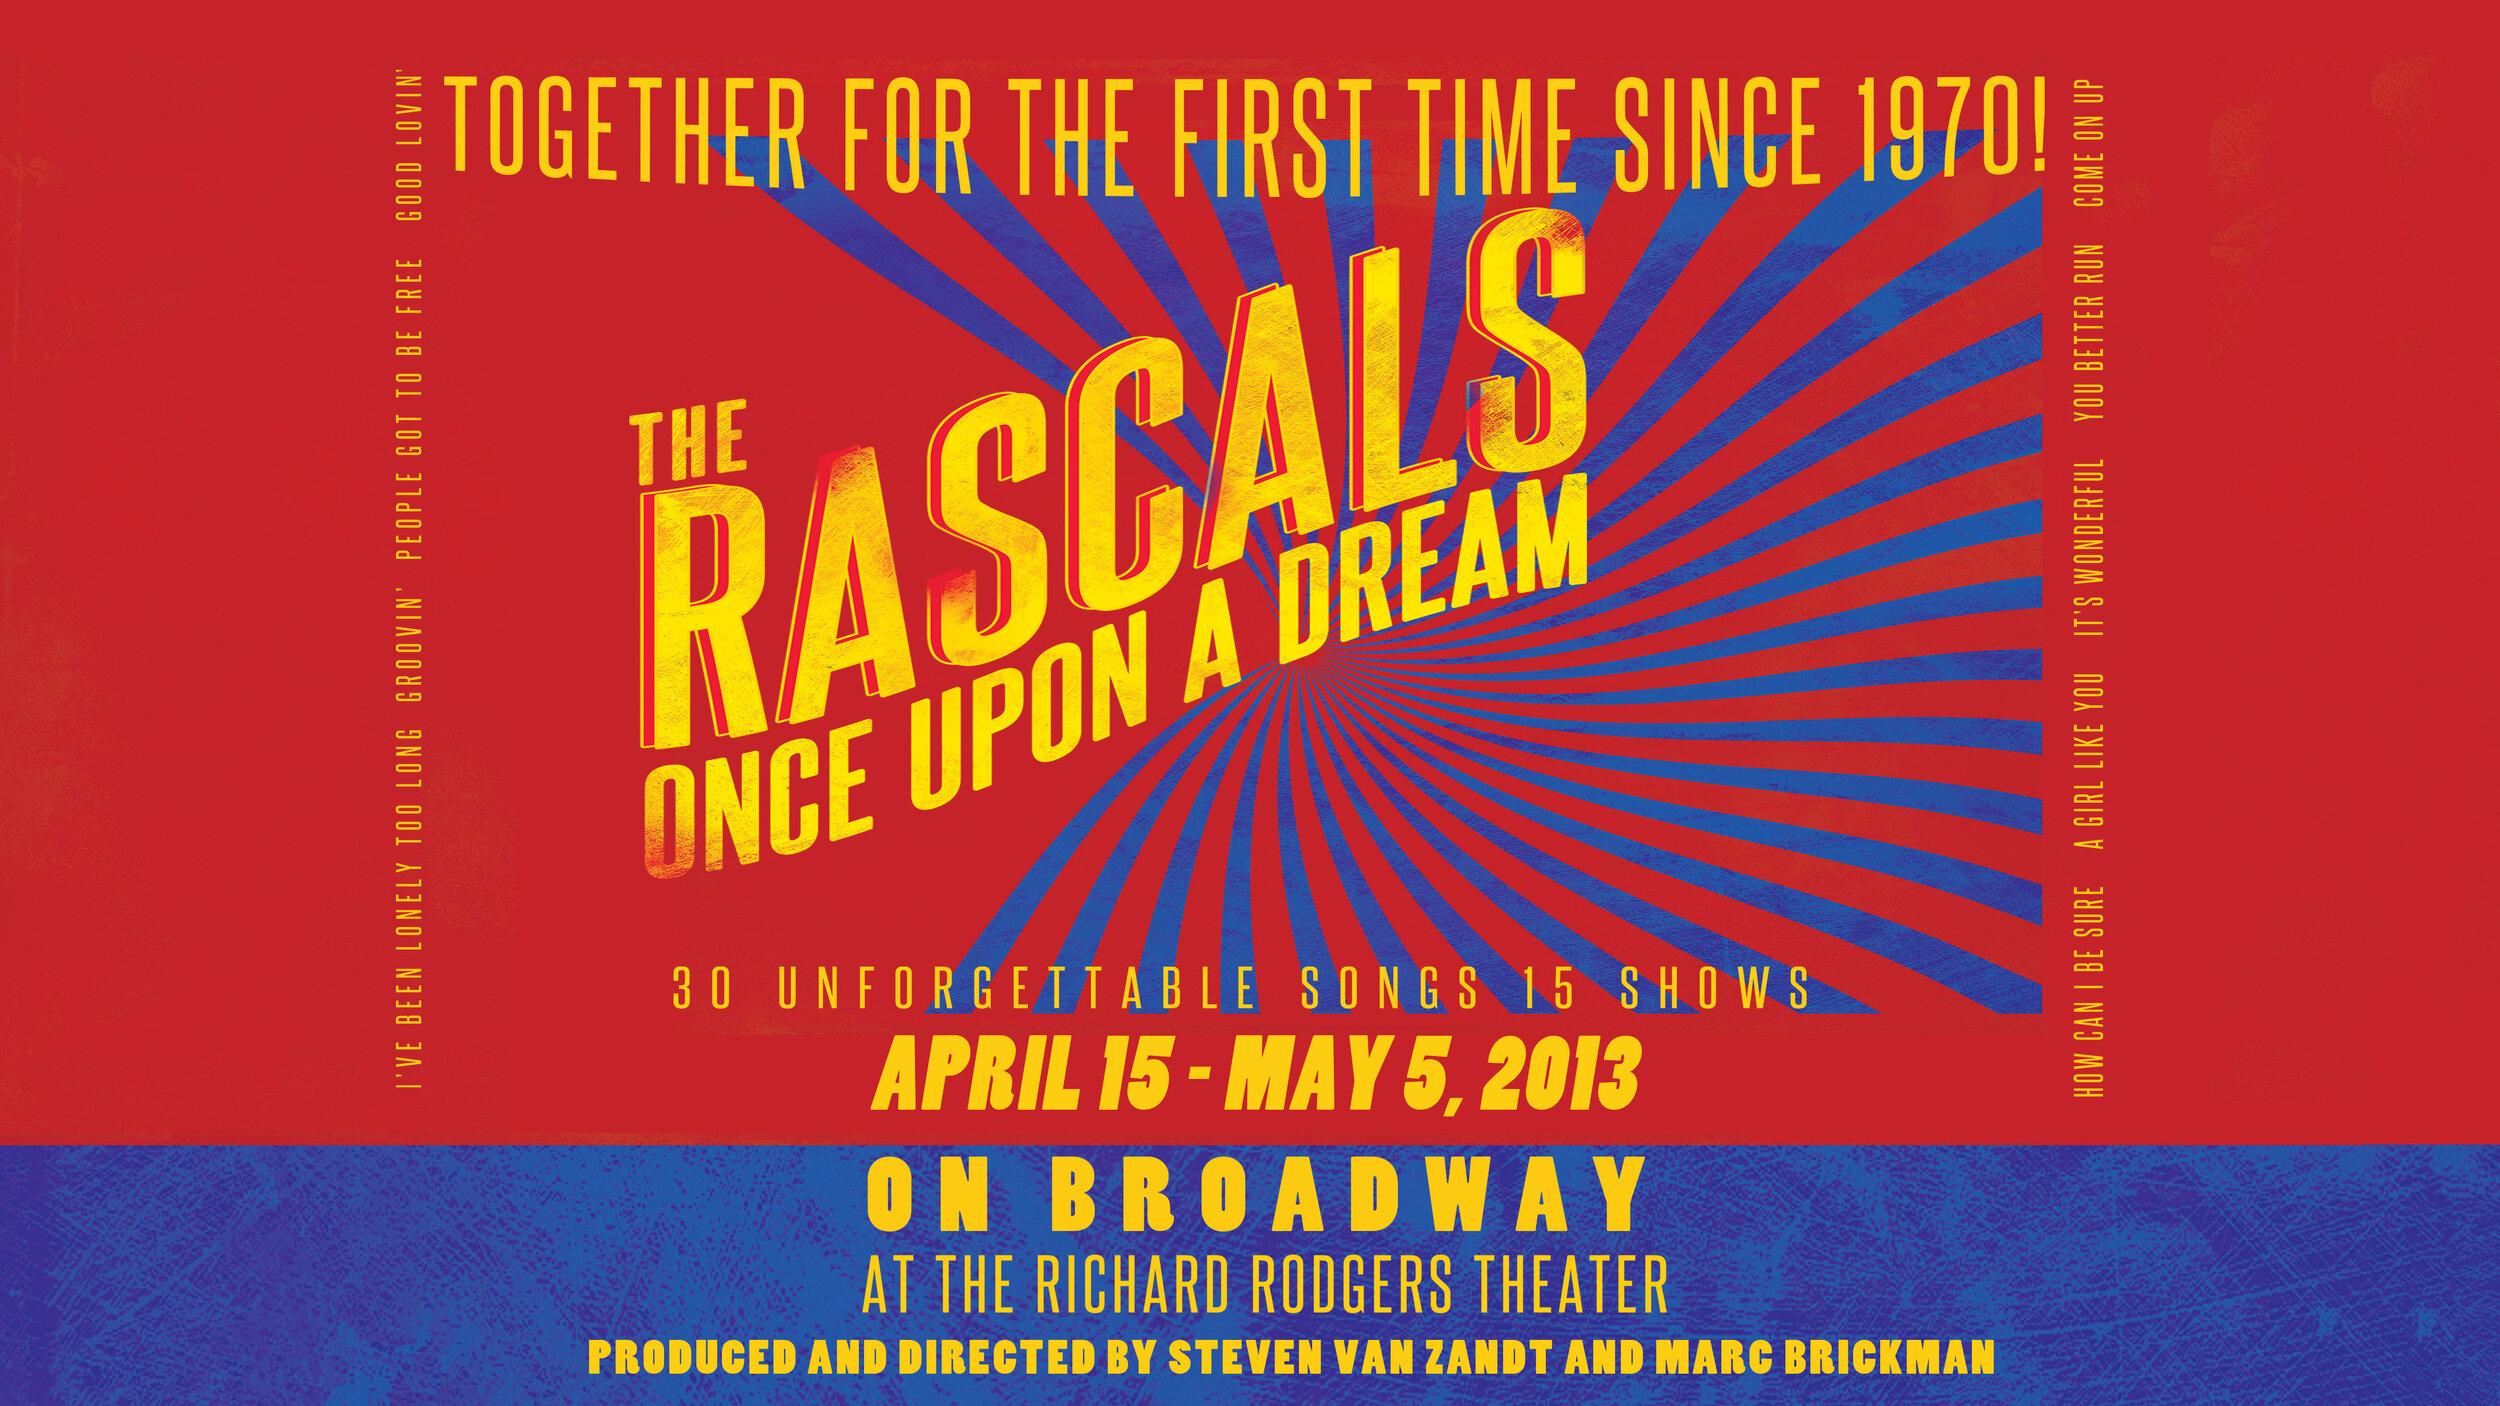 Rascals_Broadway.jpg